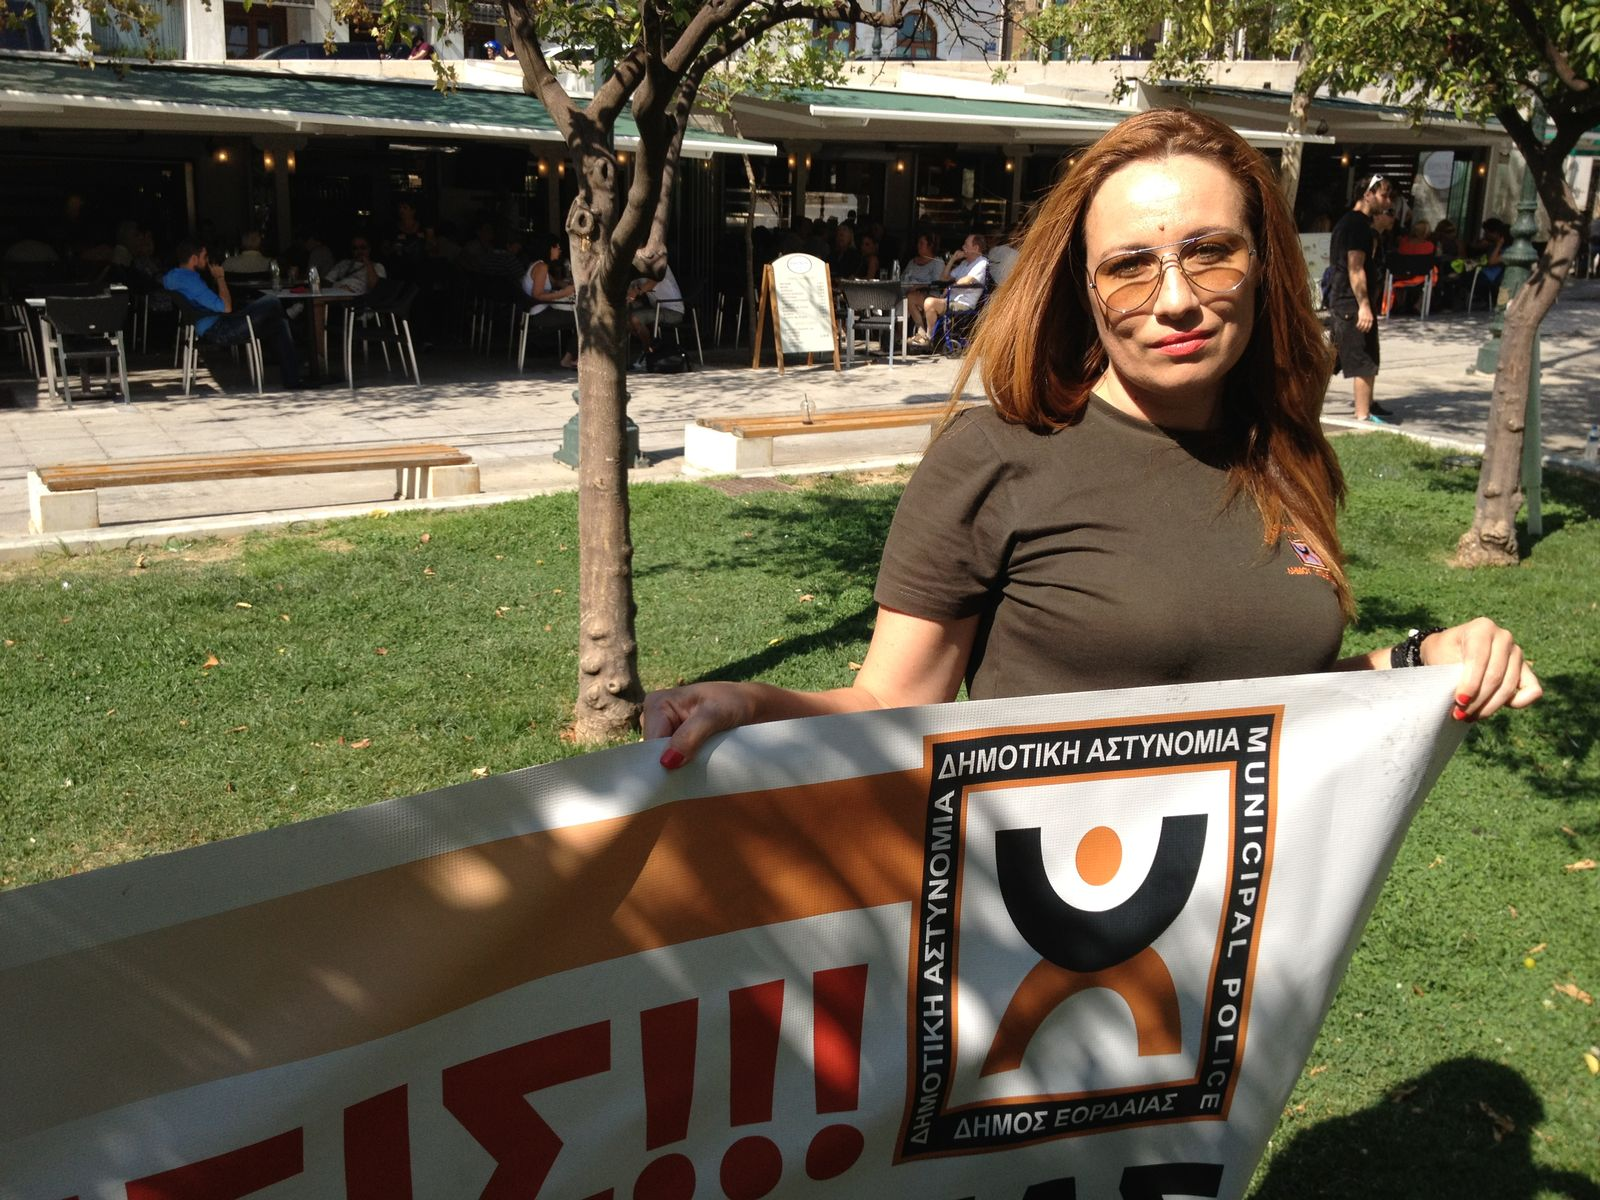 Griechenland / Protest / Kommunalpolizistin Vasiliki Pagouni